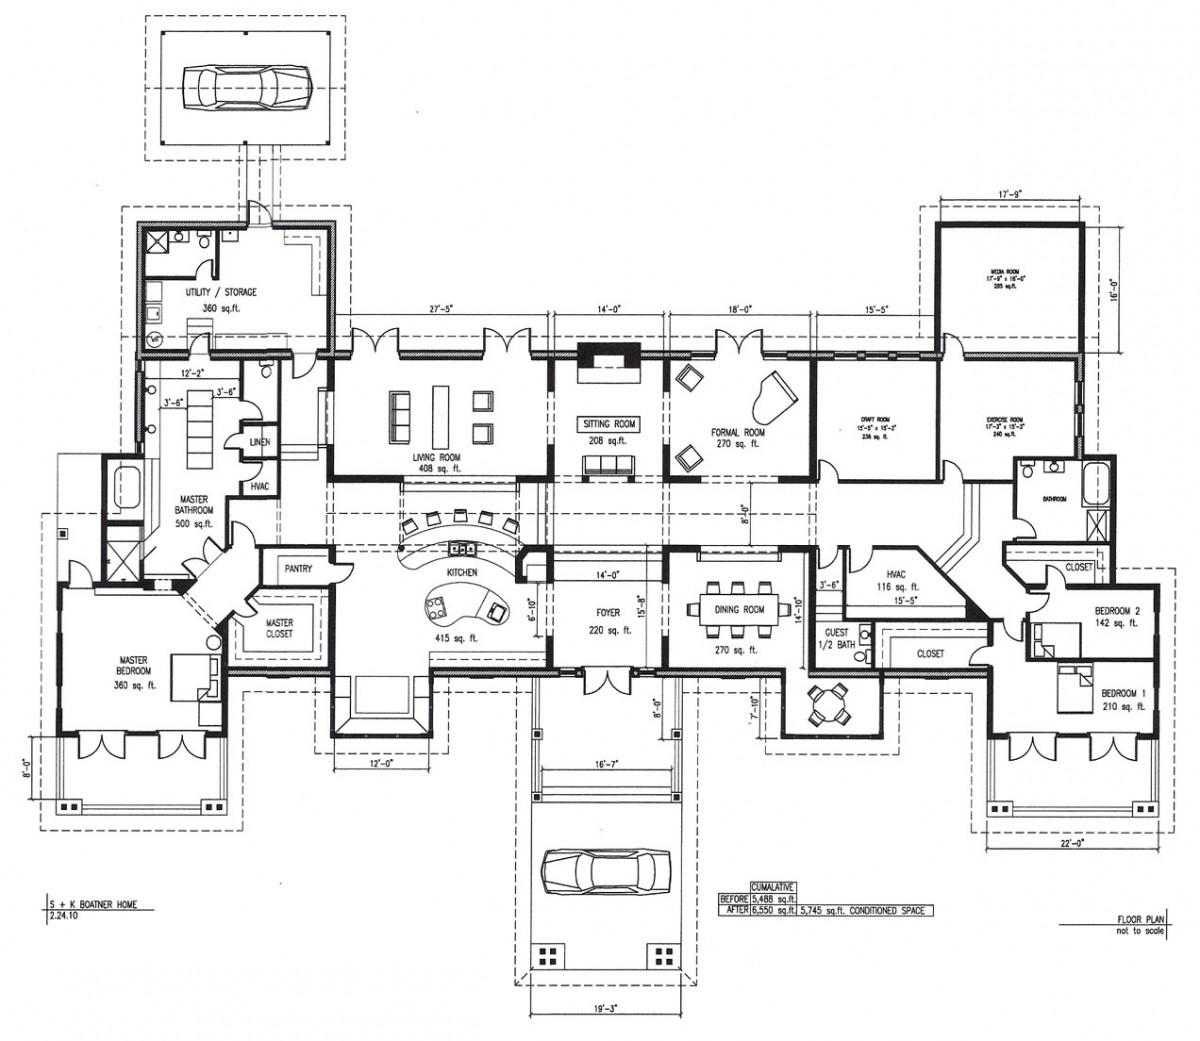 kylestribling.com » S + K Boatner Home